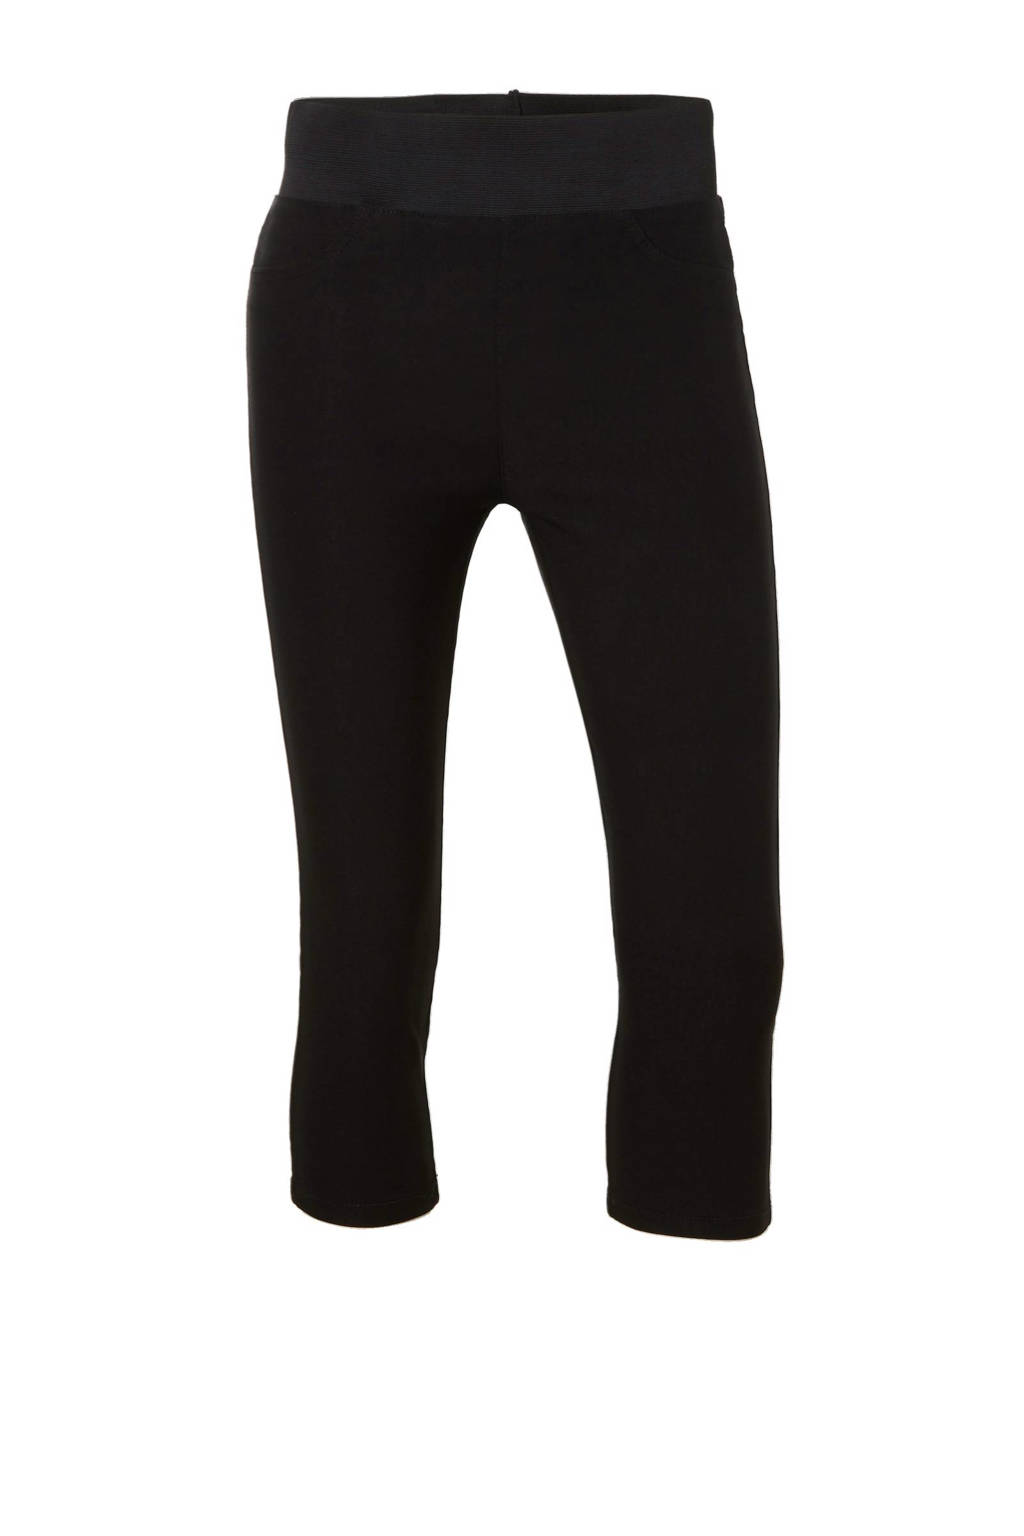 FREEQUENT slim fit capri jeans Shantal black, Zwart